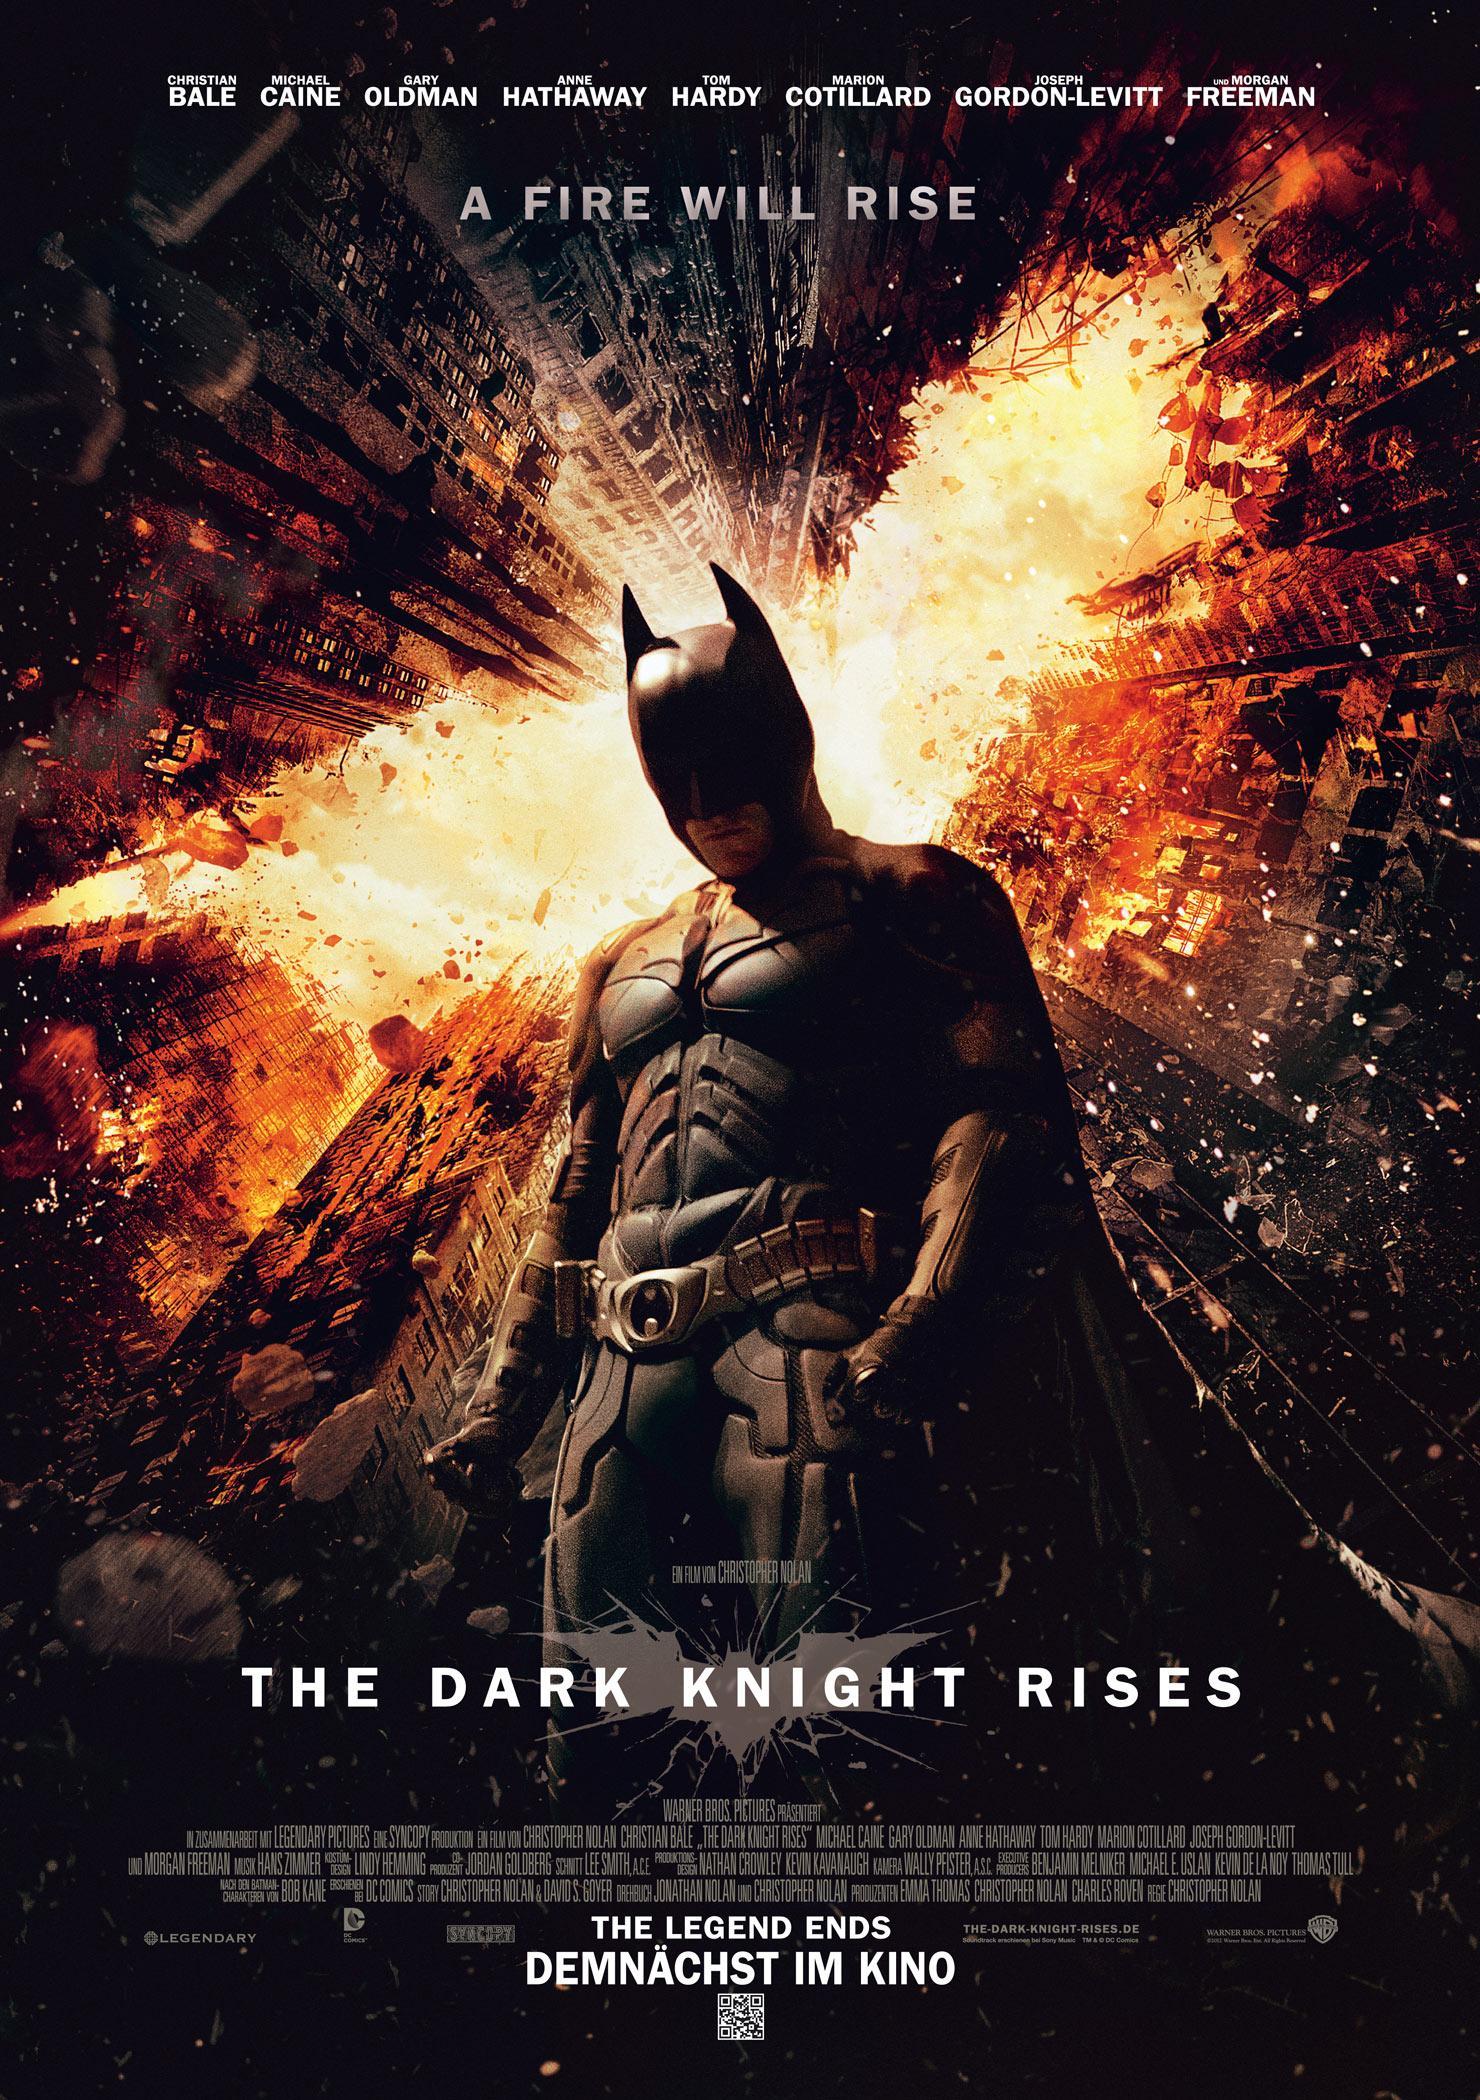 The Dark Knight Rises (Poster)